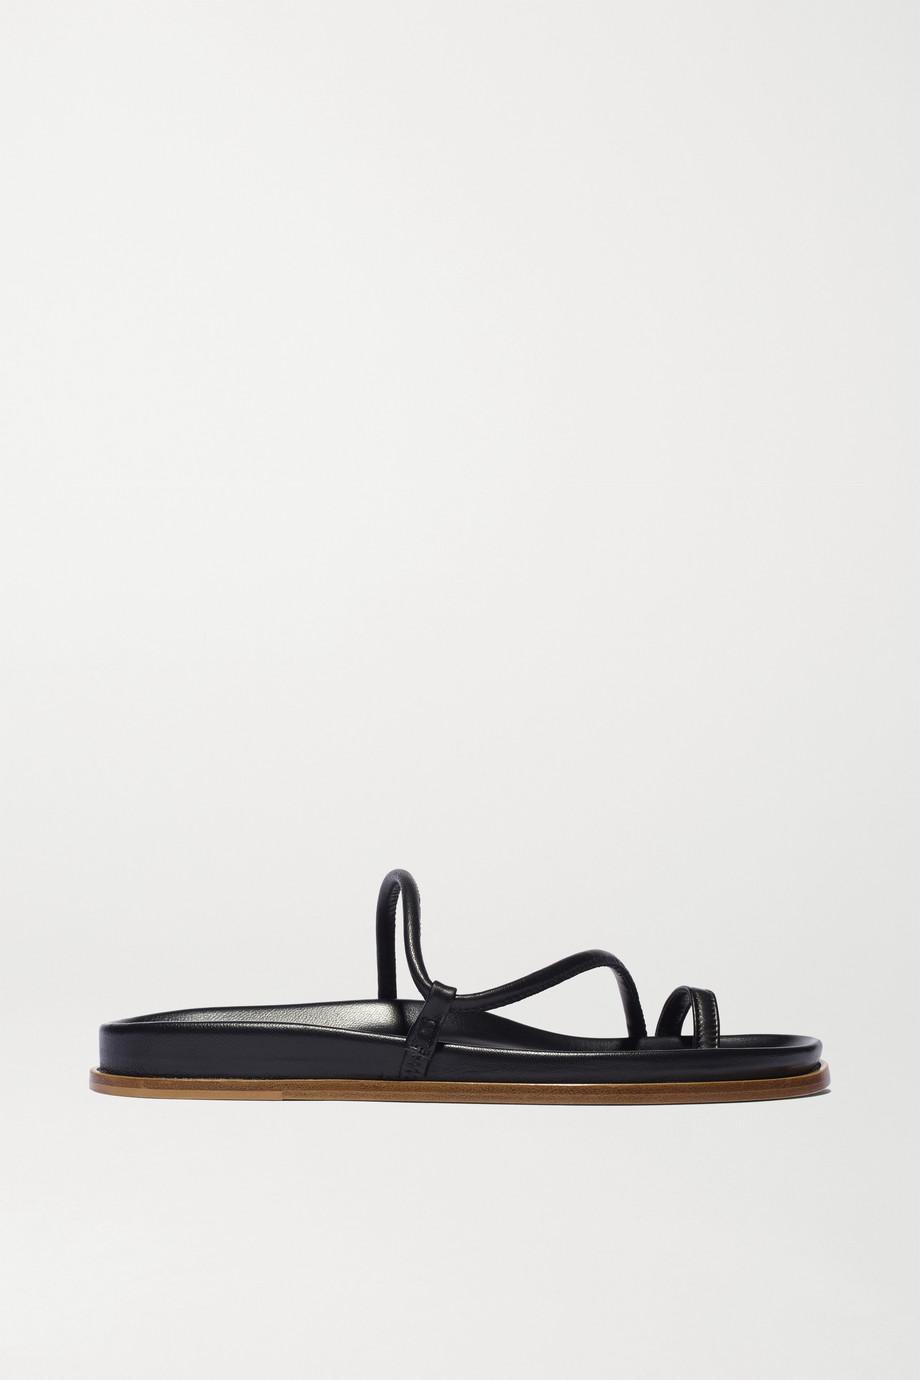 Emme Parsons Bari 皮革凉鞋